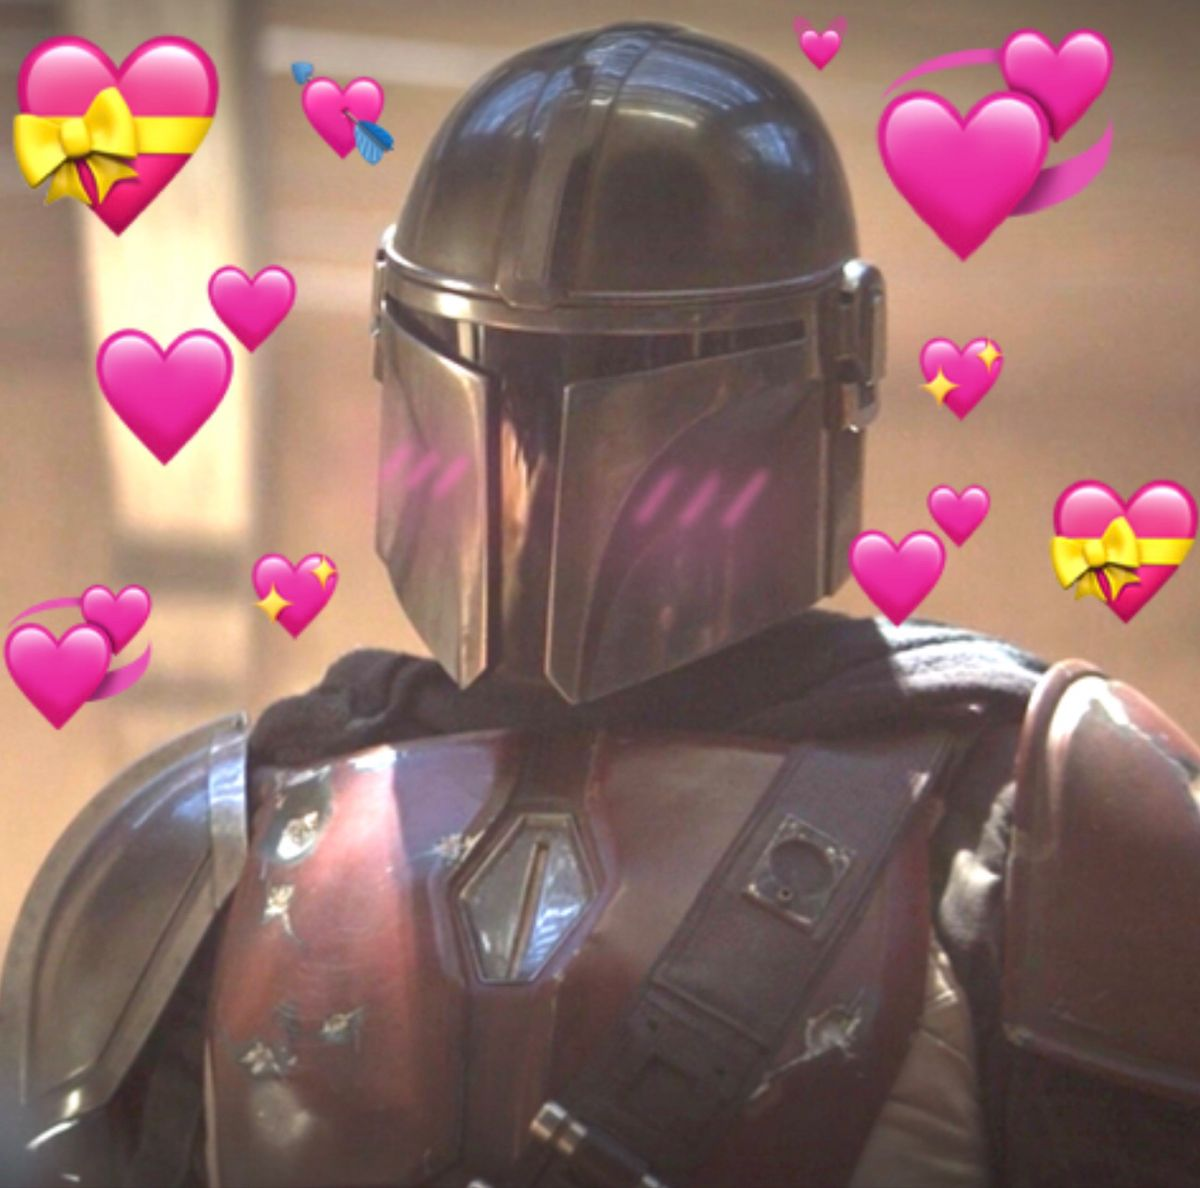 Pin By Lilybeth On Fandommmssss Star Wars Memes Star Wars Mood Pics